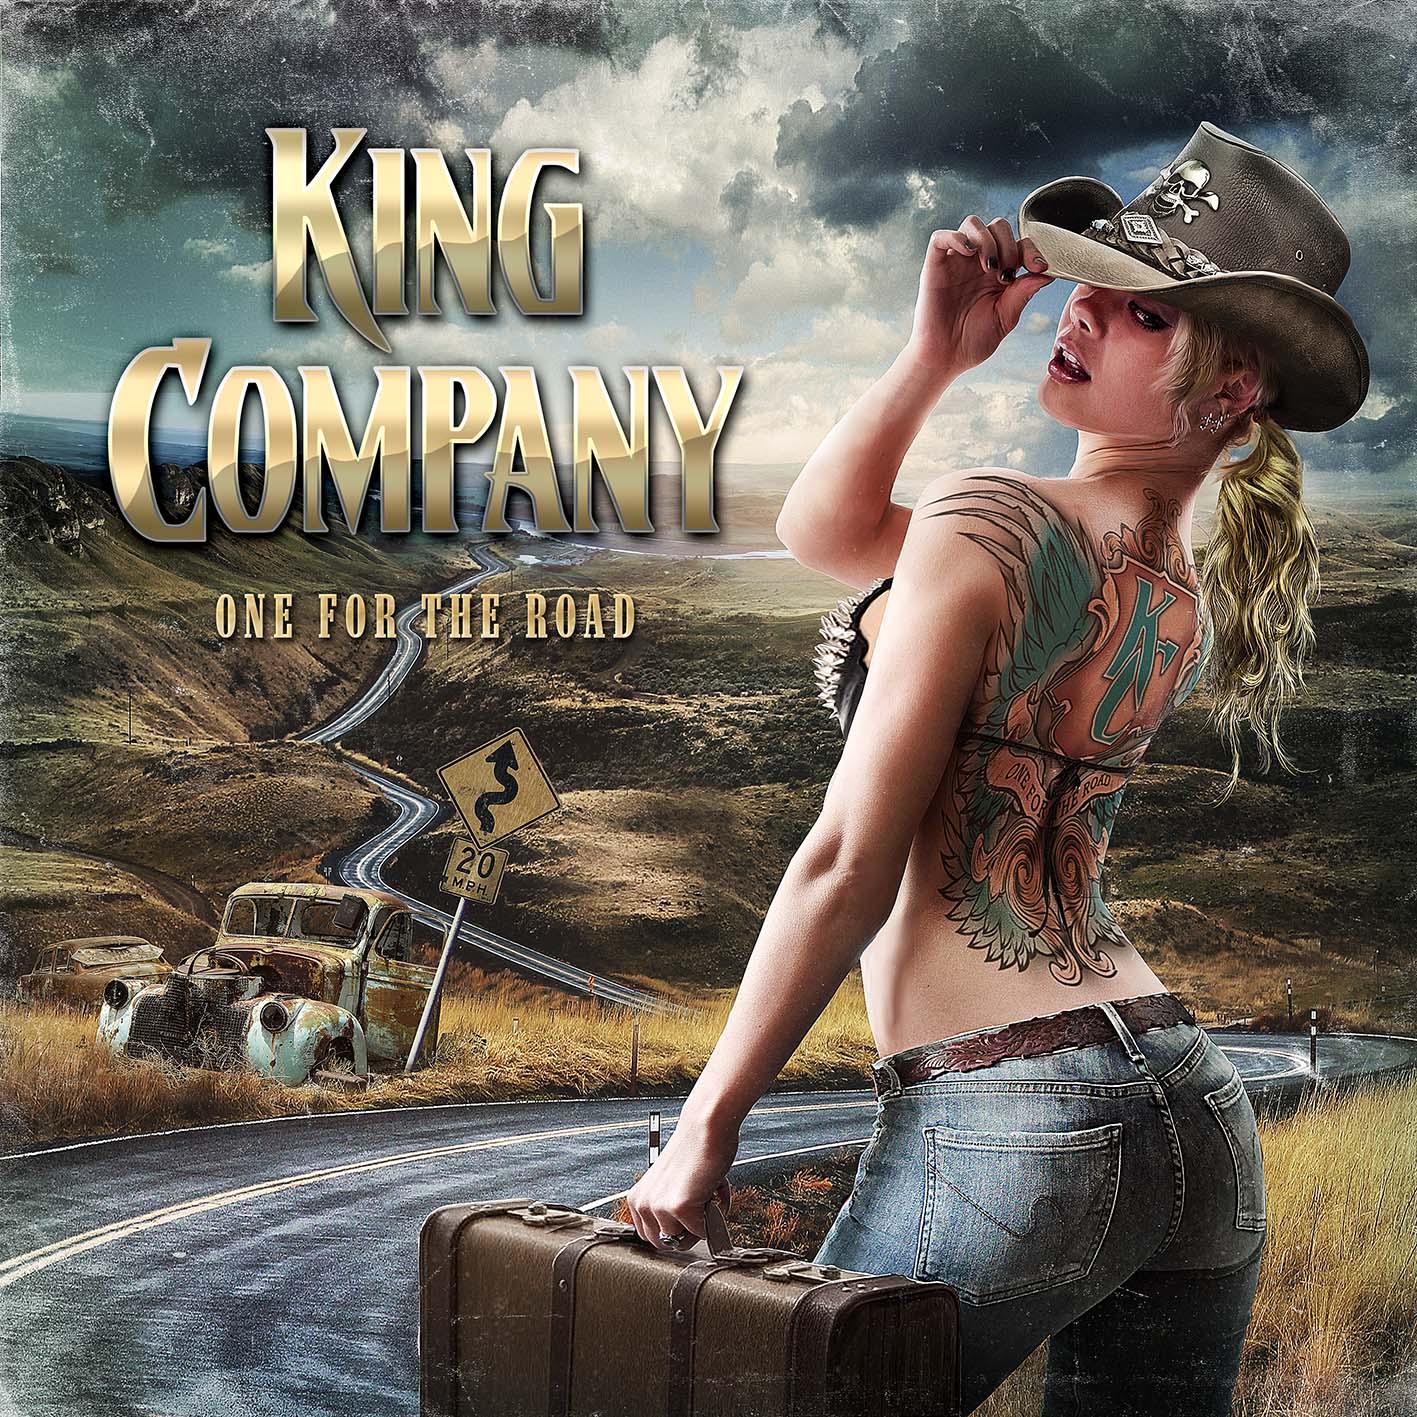 KING COMPANY oftr cover